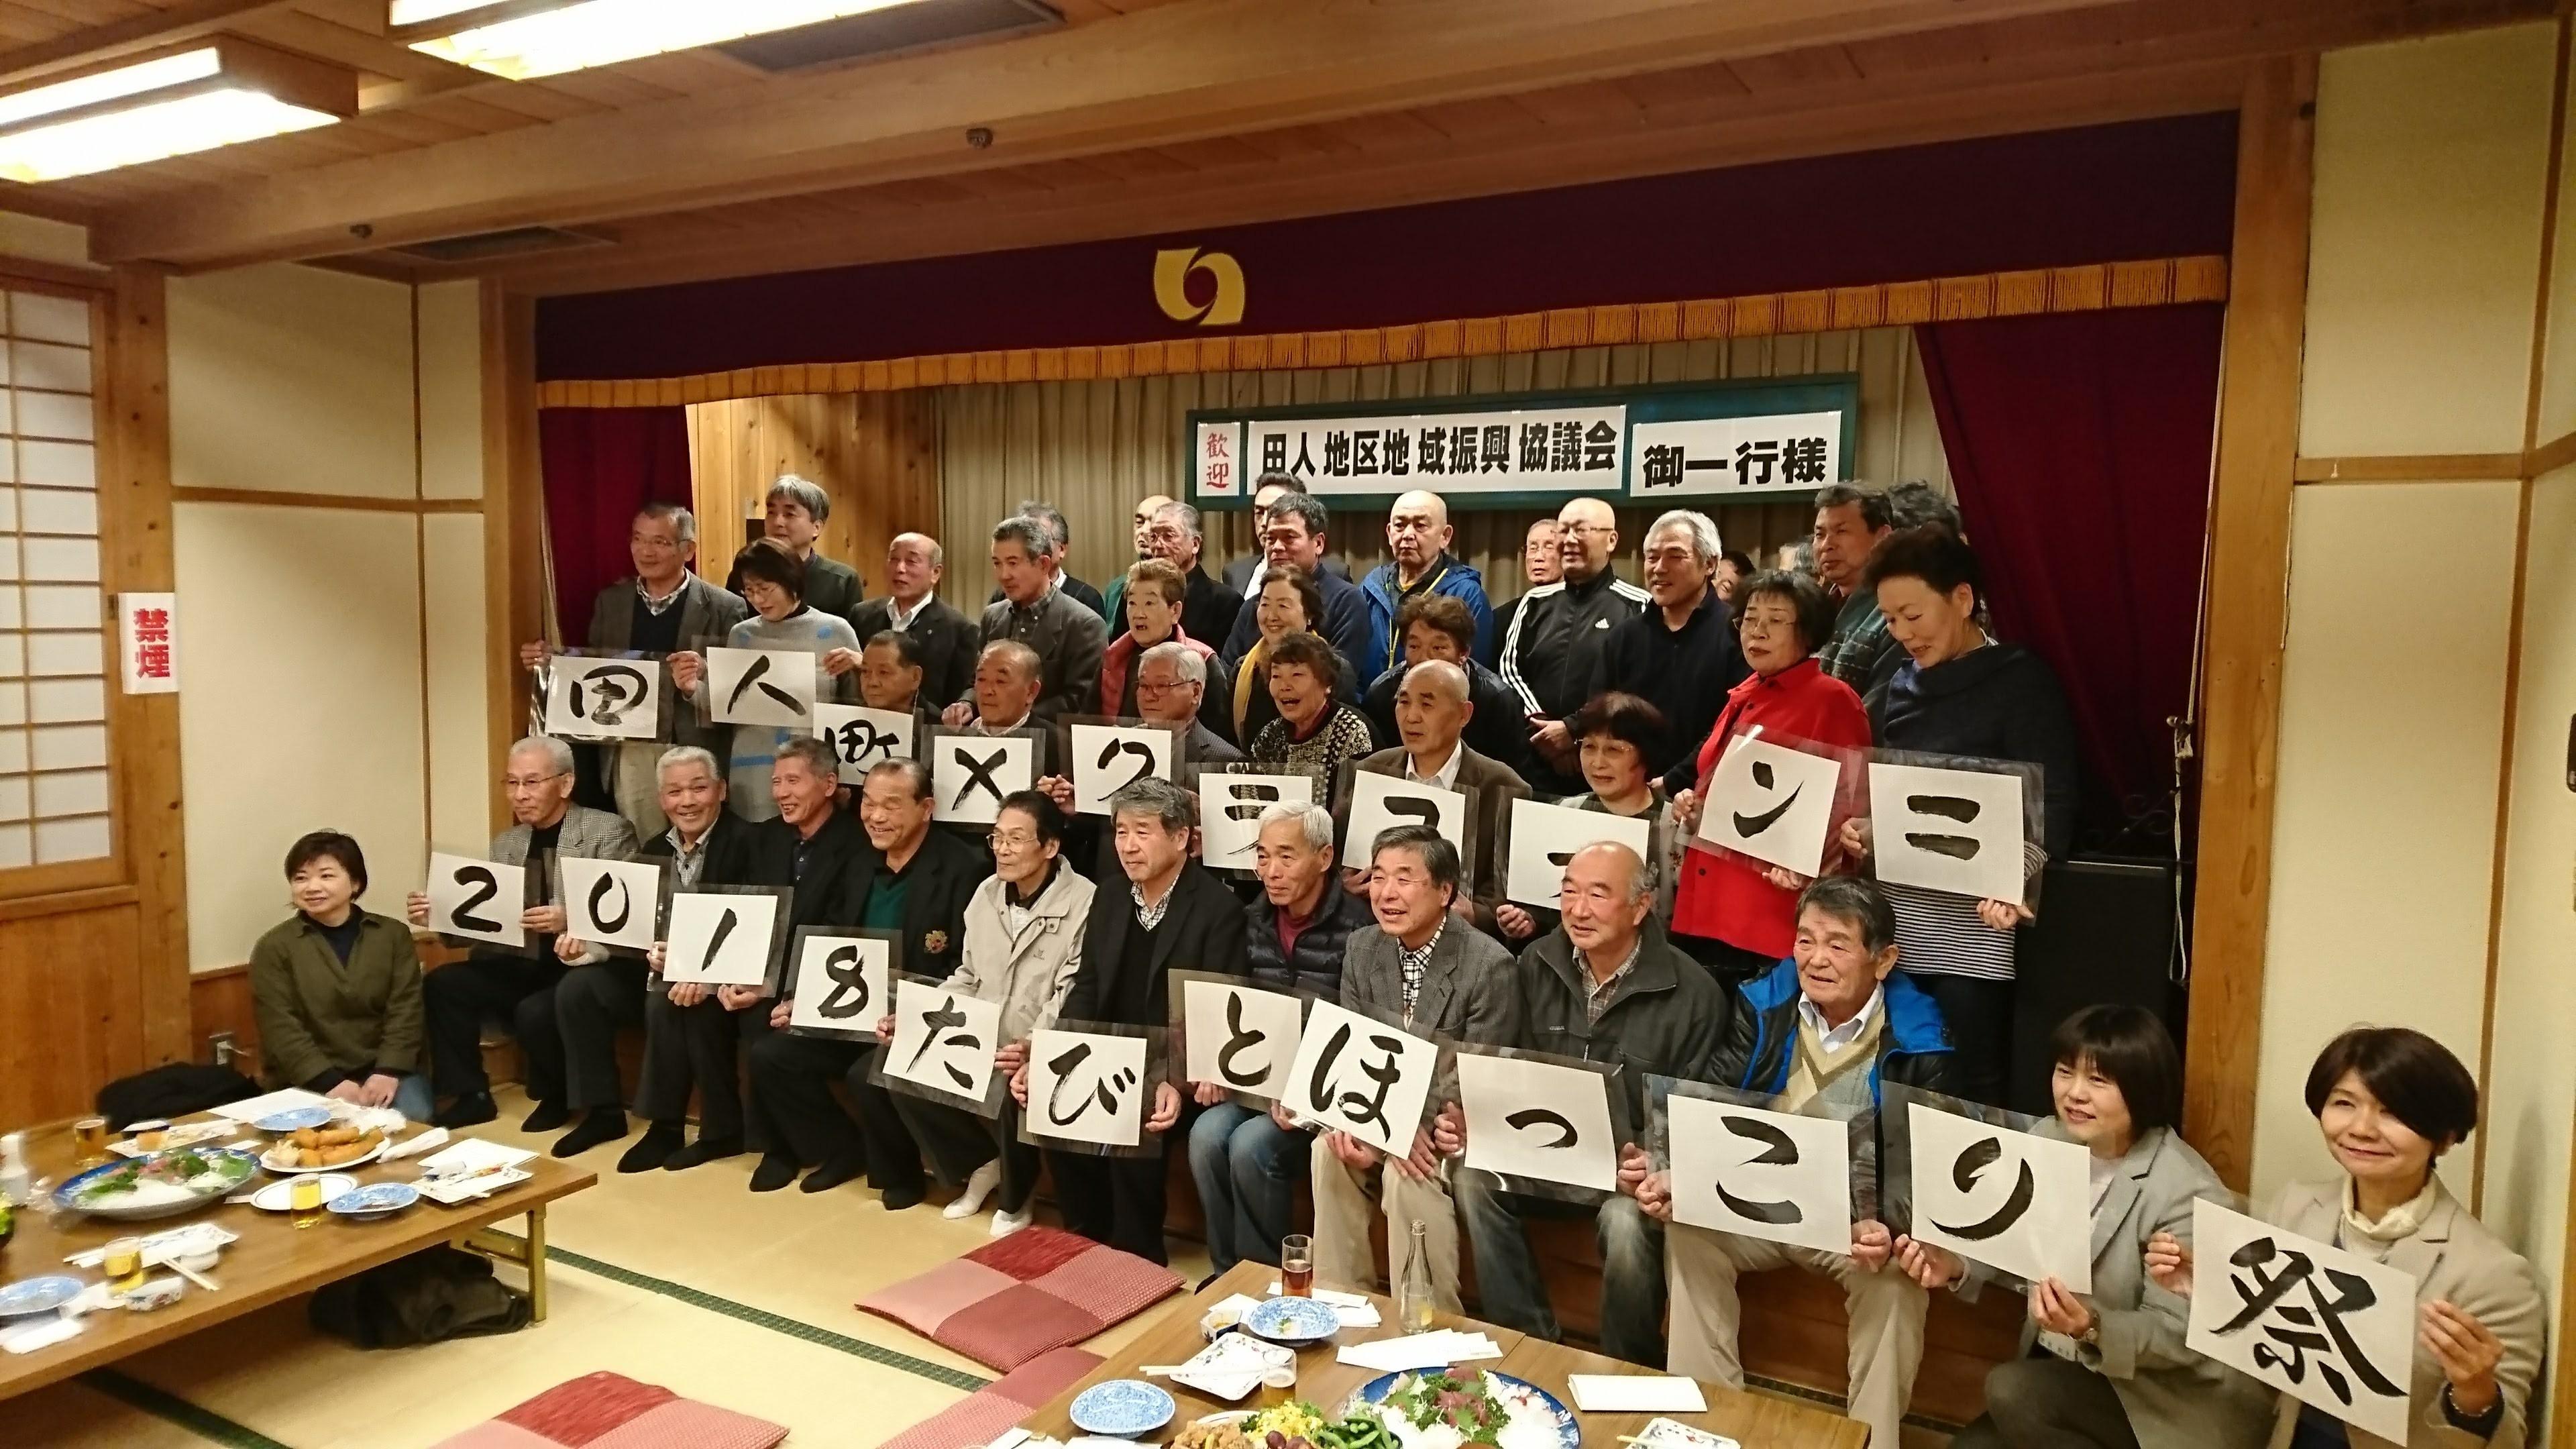 H29ほっこり祭打ち上げ(兼田人地域振興協議会忘年会)を実施しました!